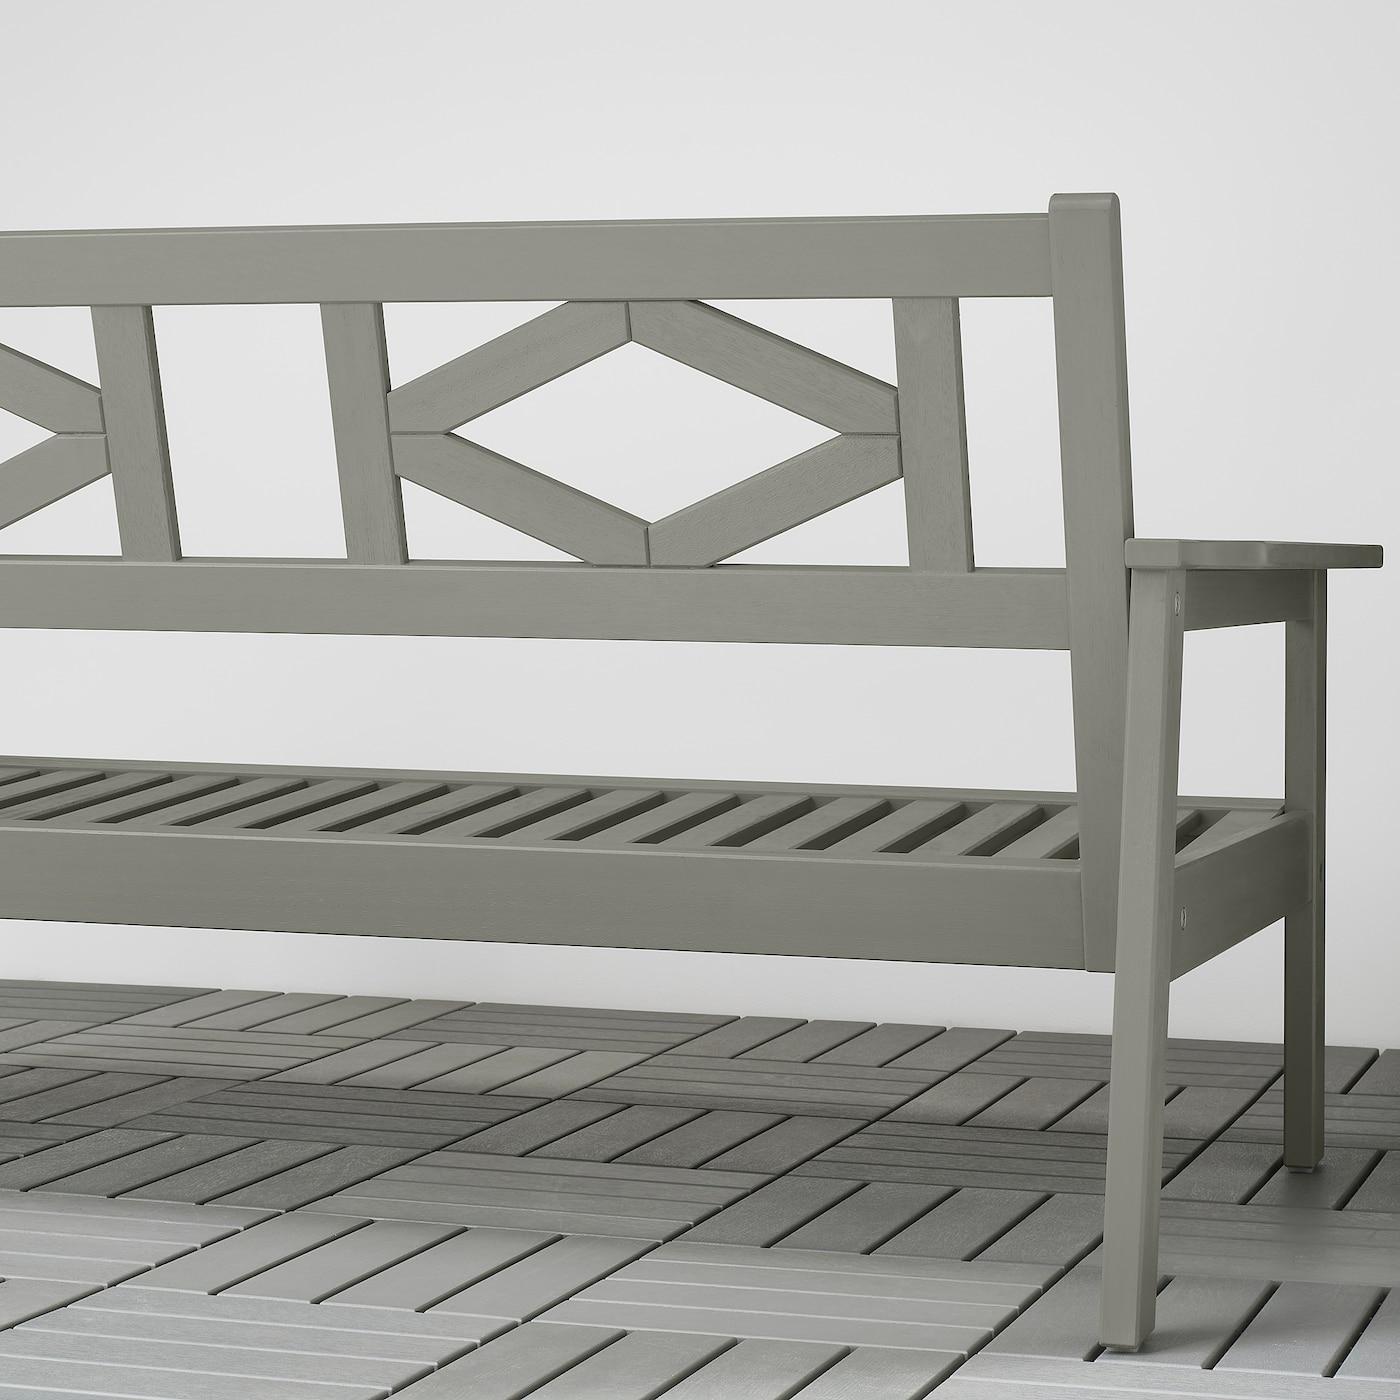 BONDHOLMEN 2-seat sofa, outdoor grey 139 cm 81 cm 73 cm 124 cm 62 cm 30 cm